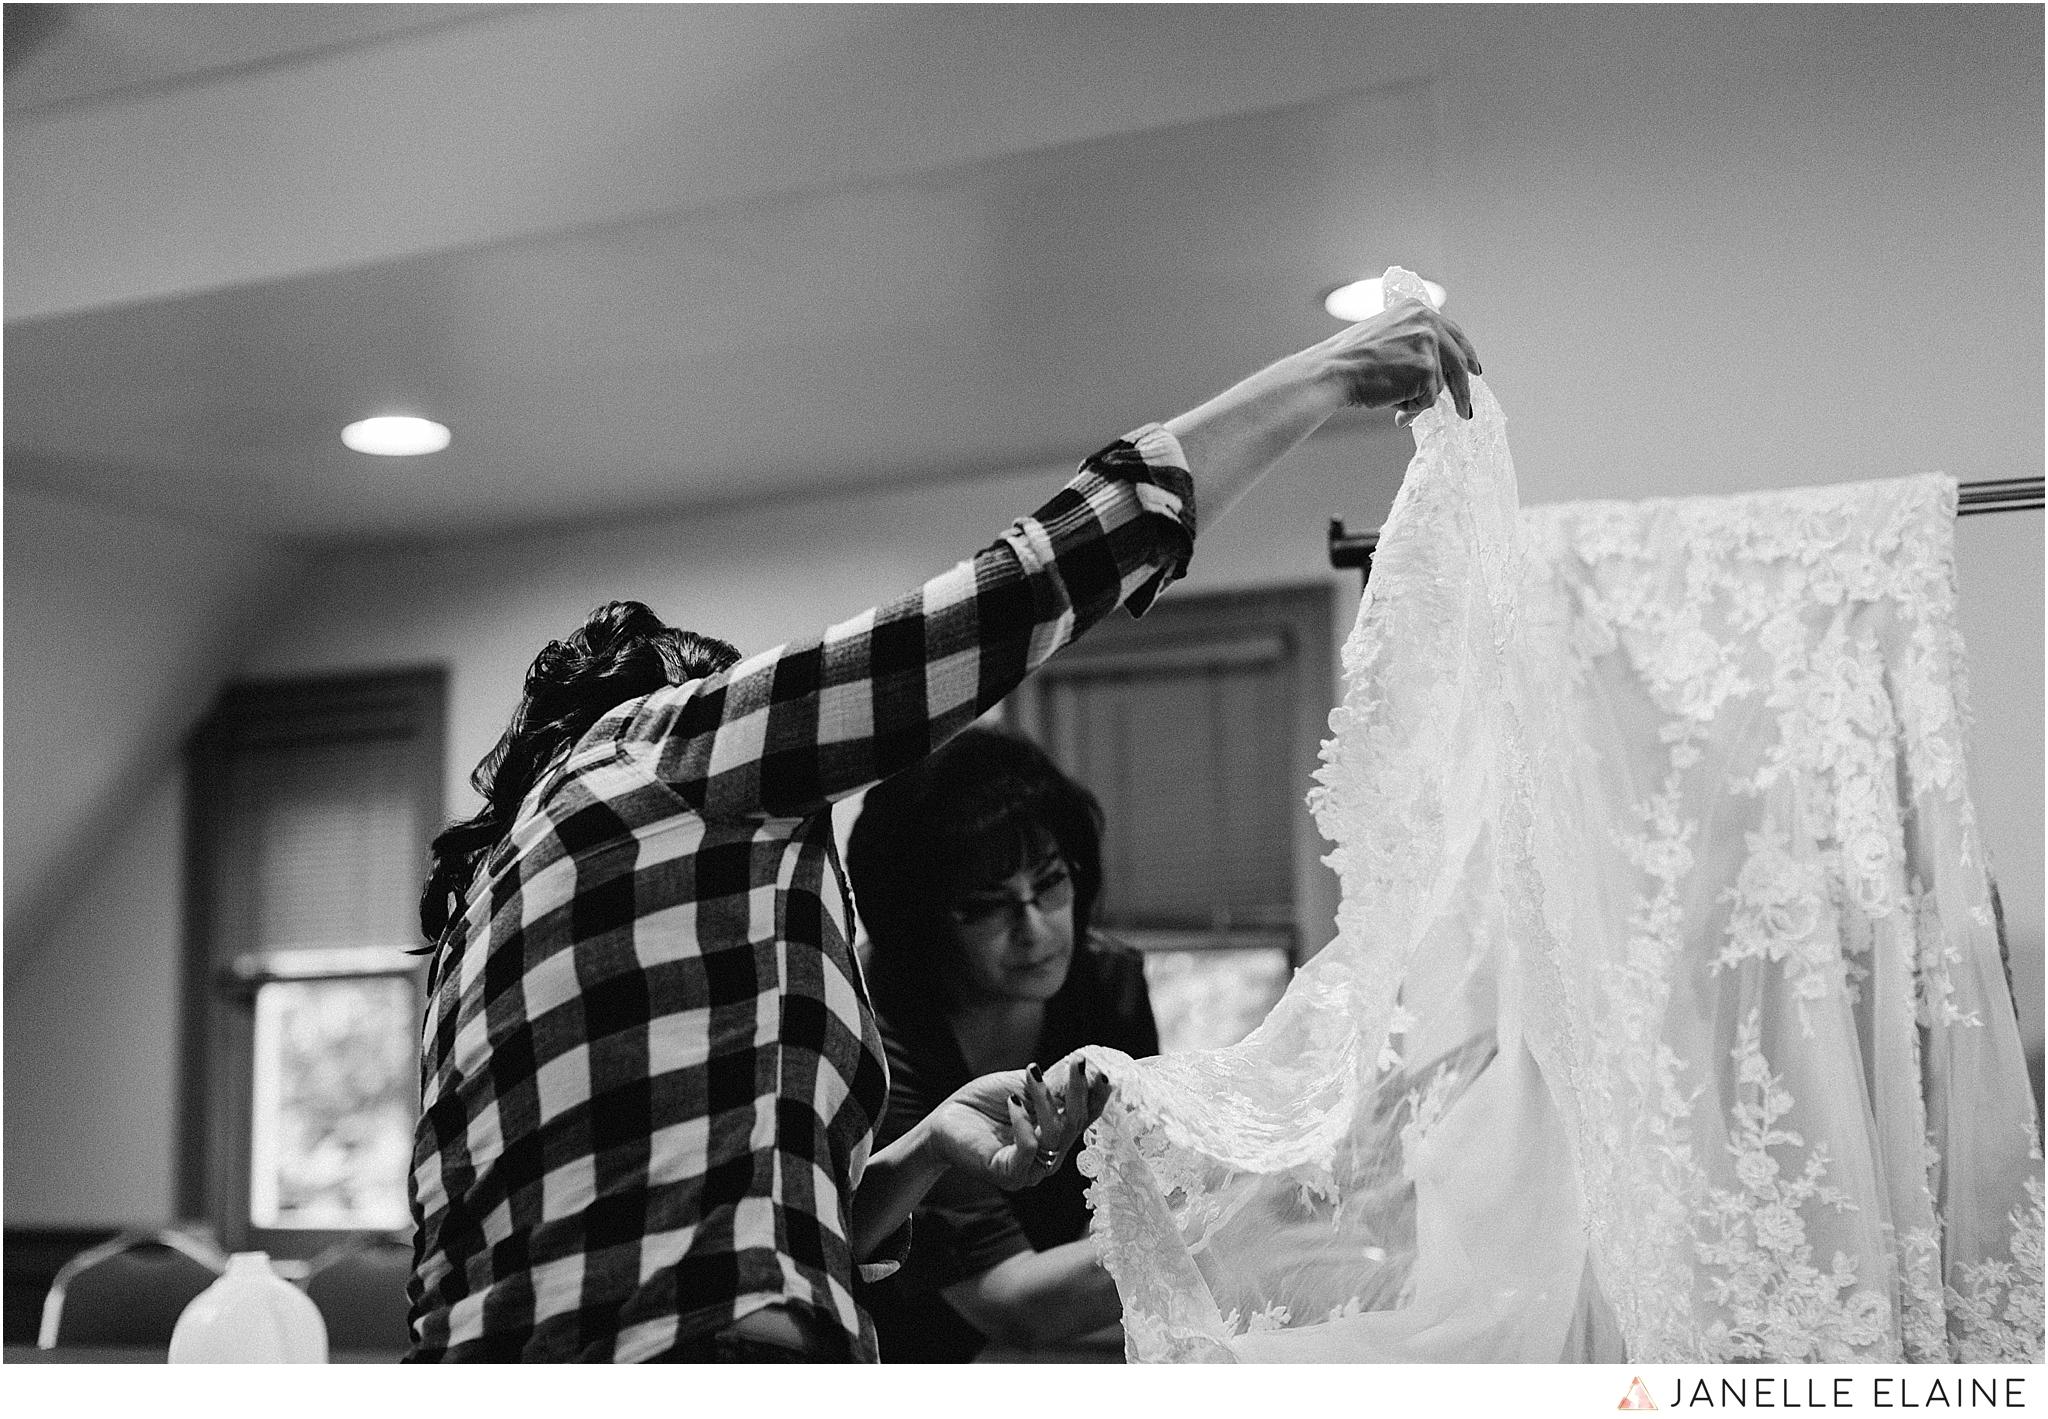 janelle elaine photography-professional wedding photographer-seattle-bellevue-robinswood house-38.jpg